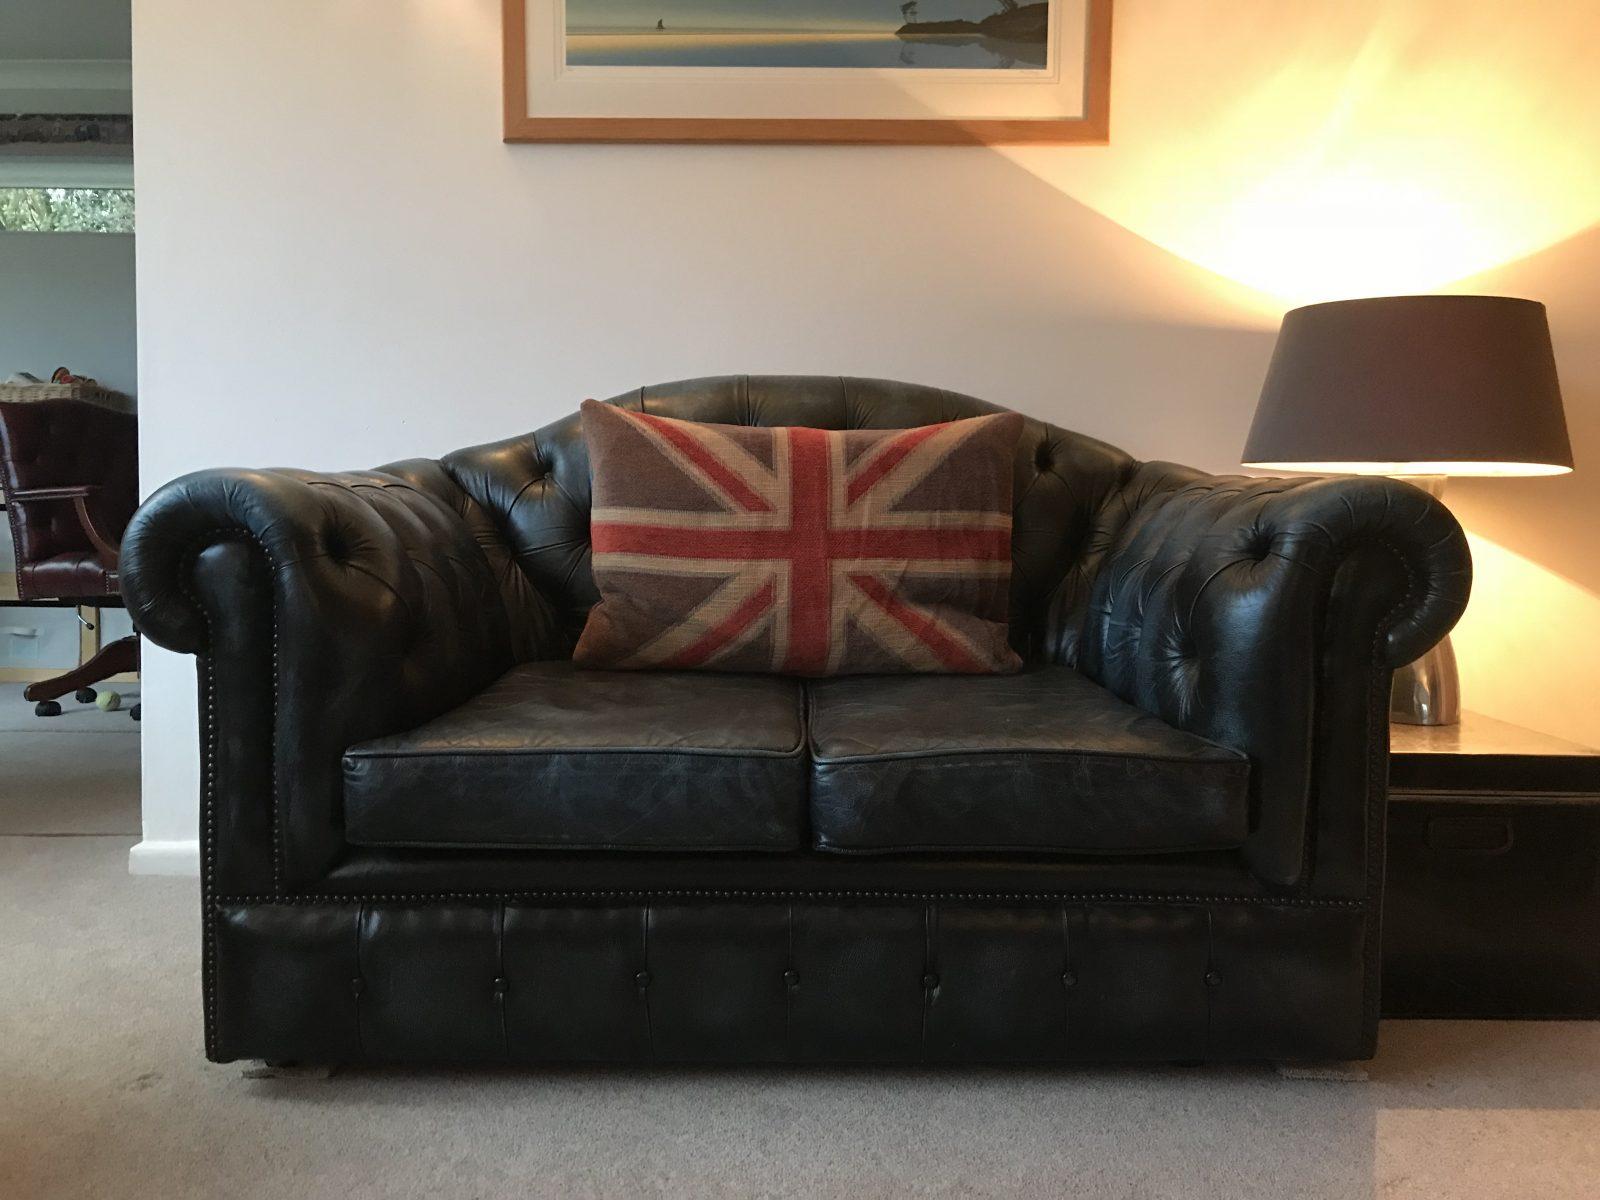 Petite Blue Camelback 2 Seater Chesterfield Sofa.